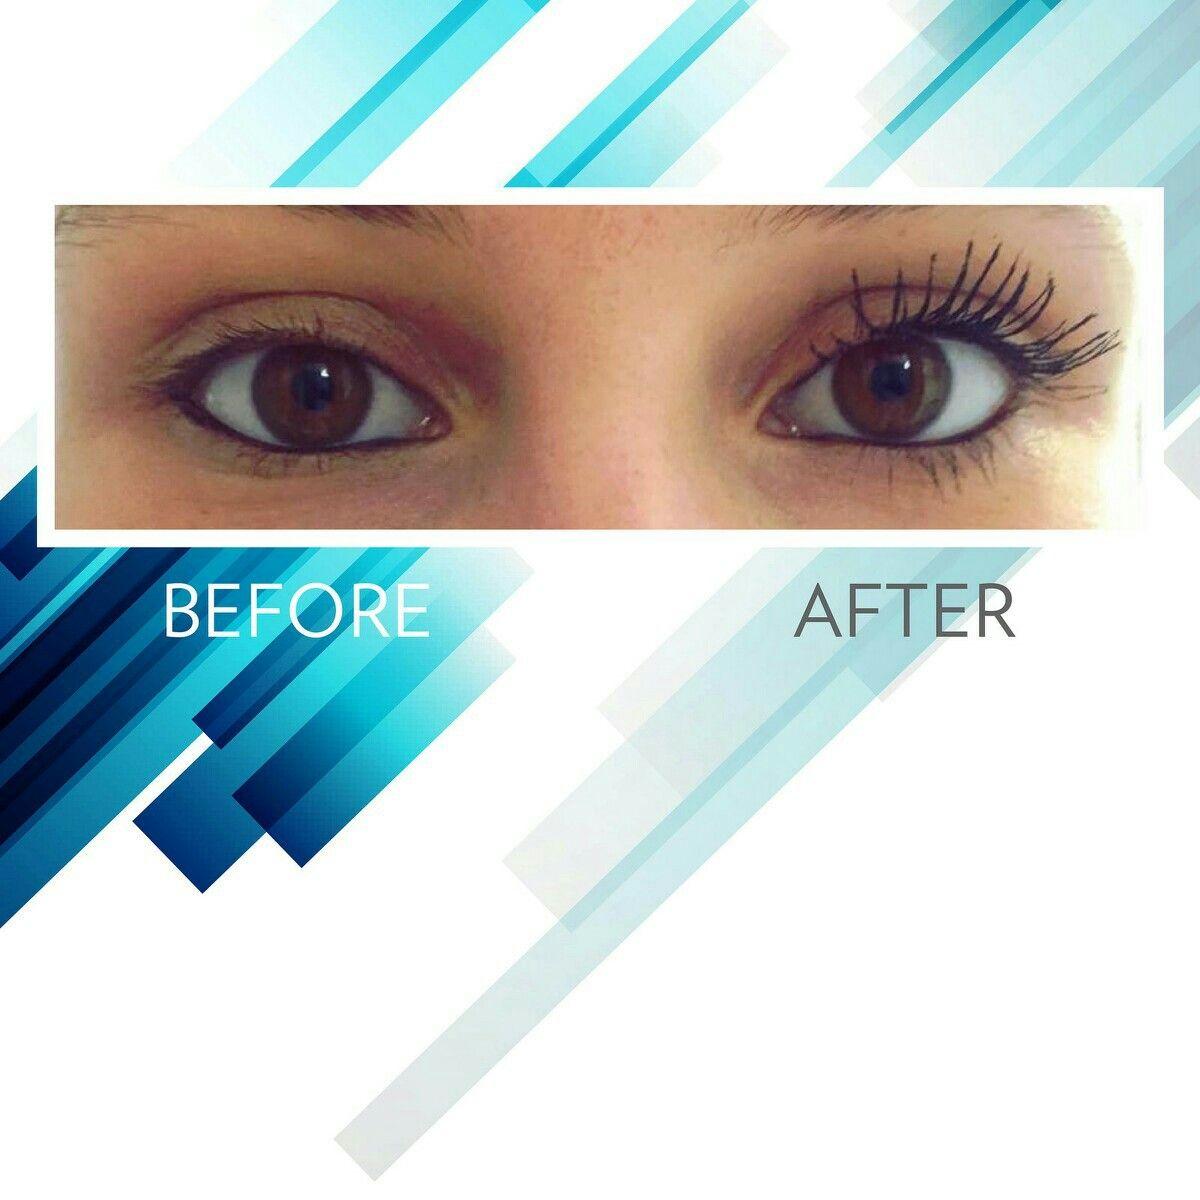 e11f5e25a23 Nu Skin Mascara | Amazing Nu Skin Products! | Nu skin mascara ...